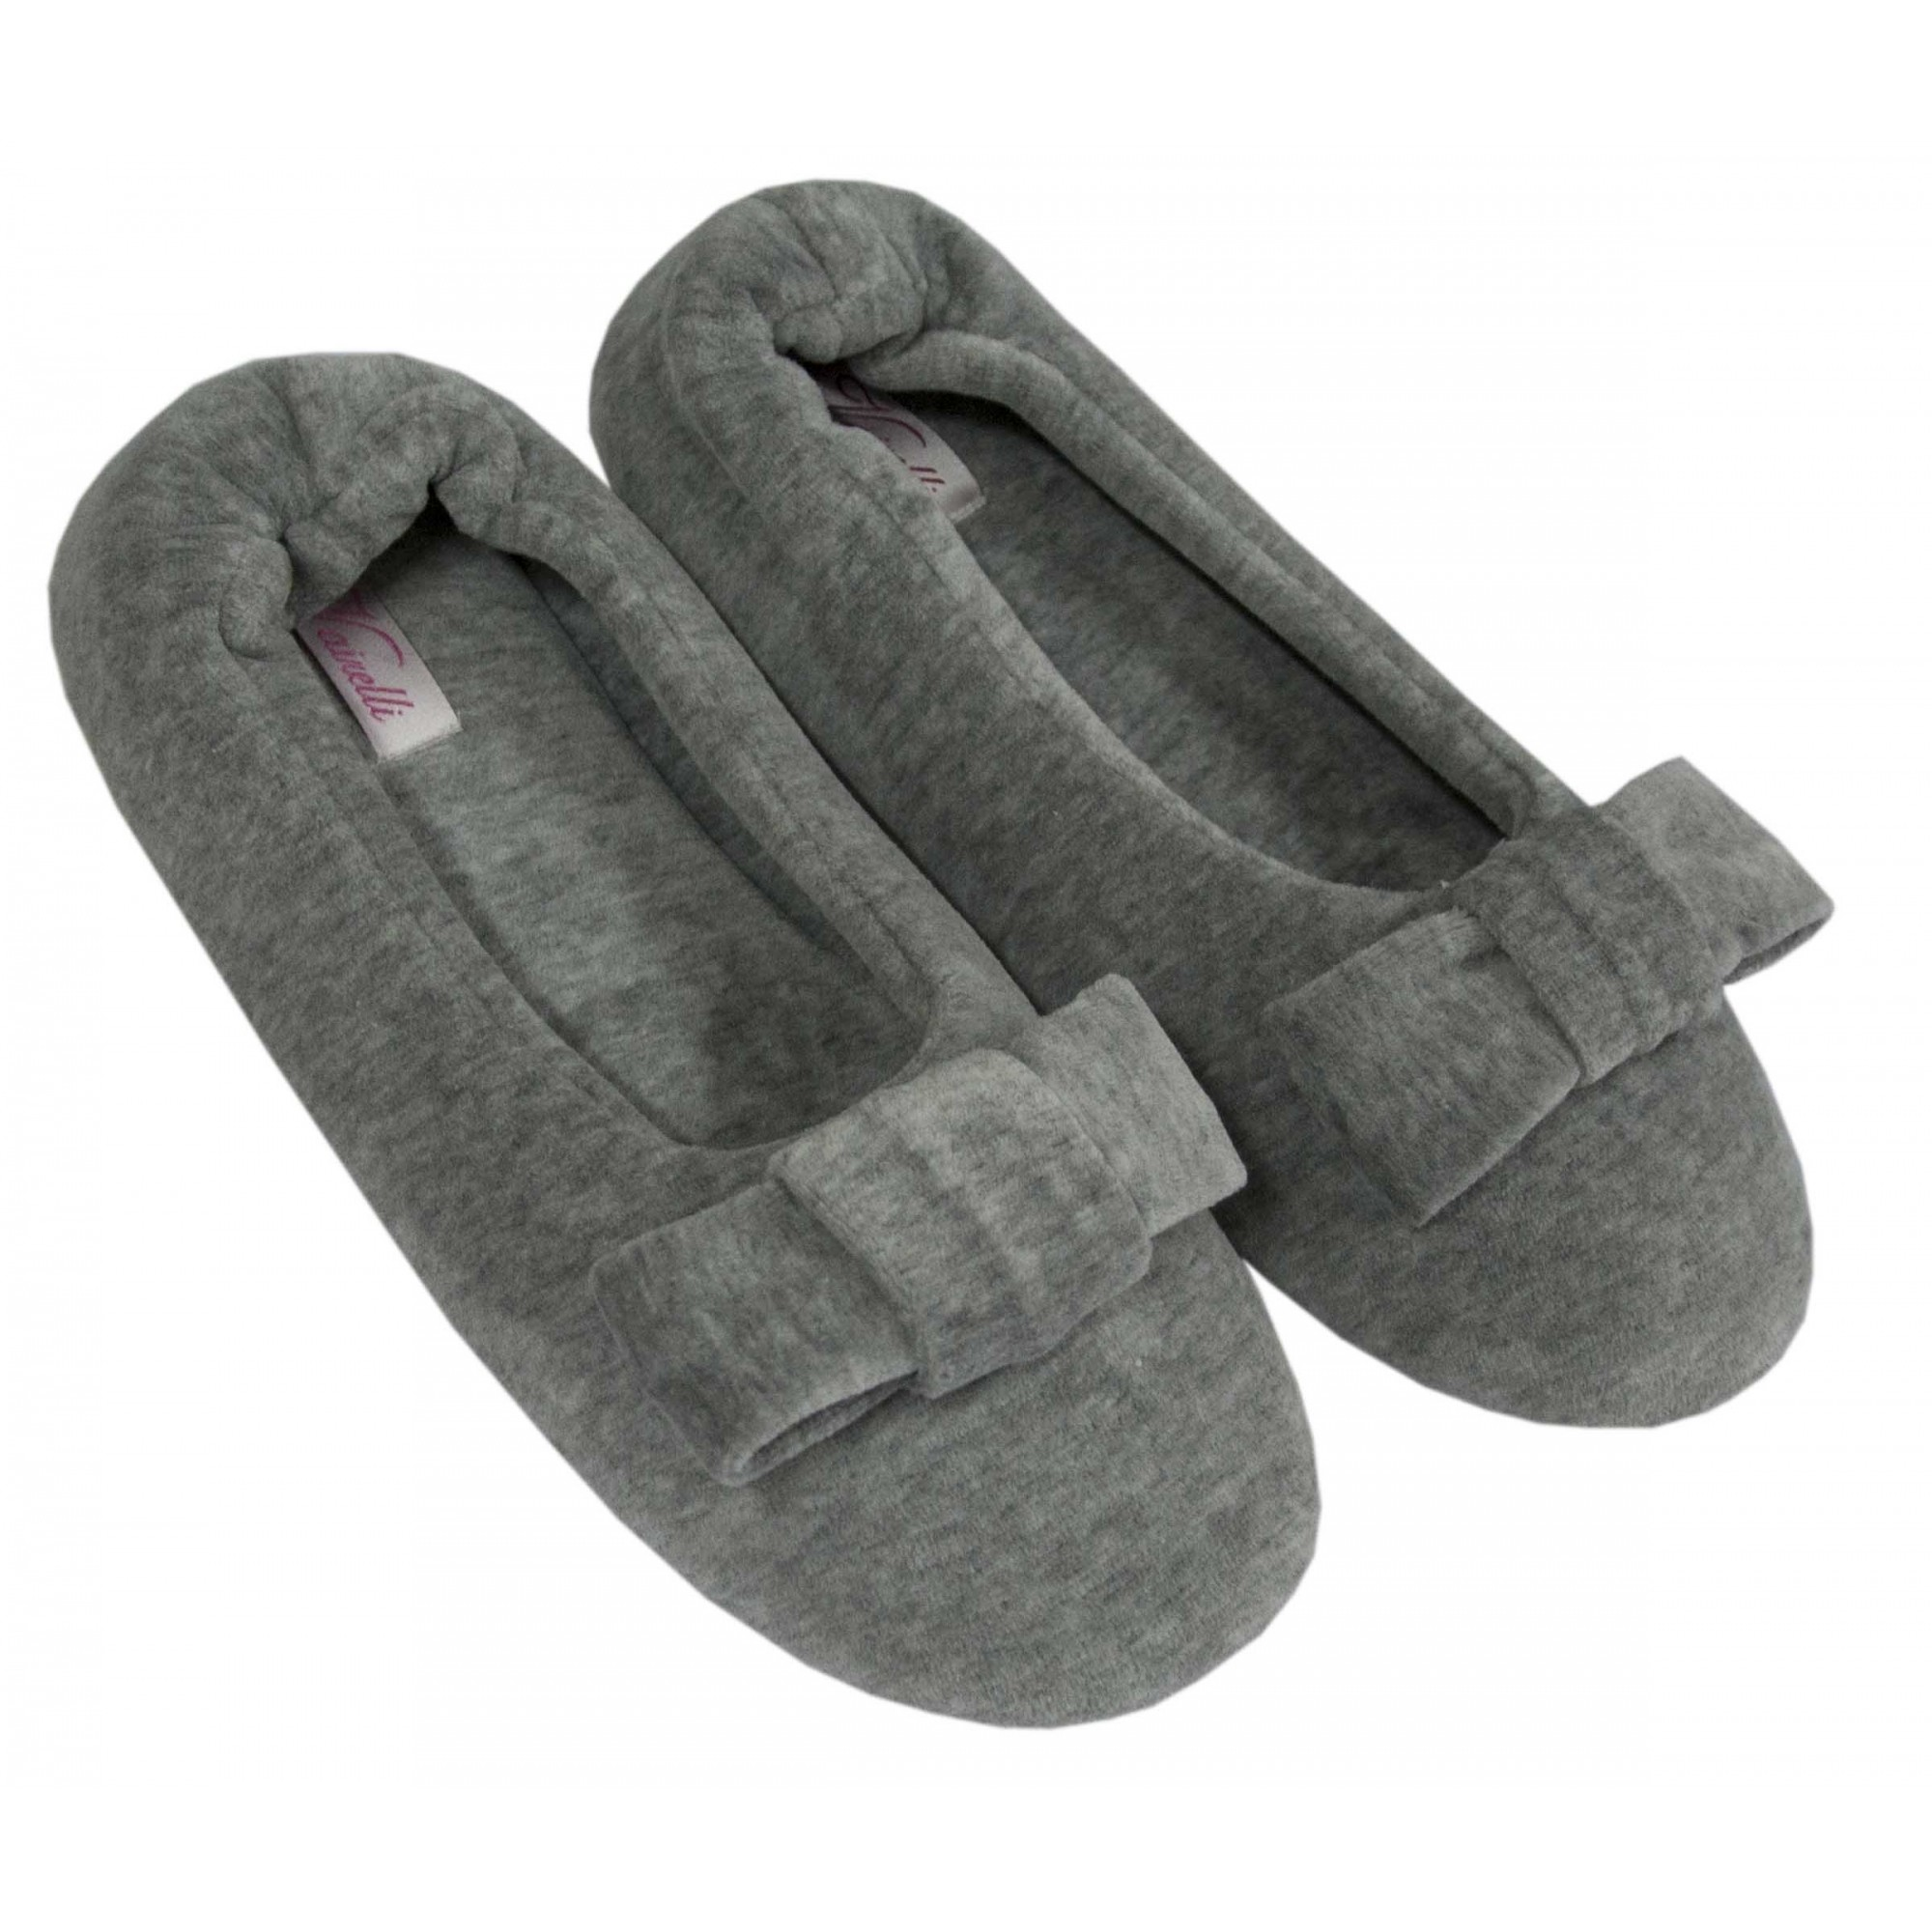 Sapatilha Feminina Vairelli Inverno em Plush SL Super Confortável